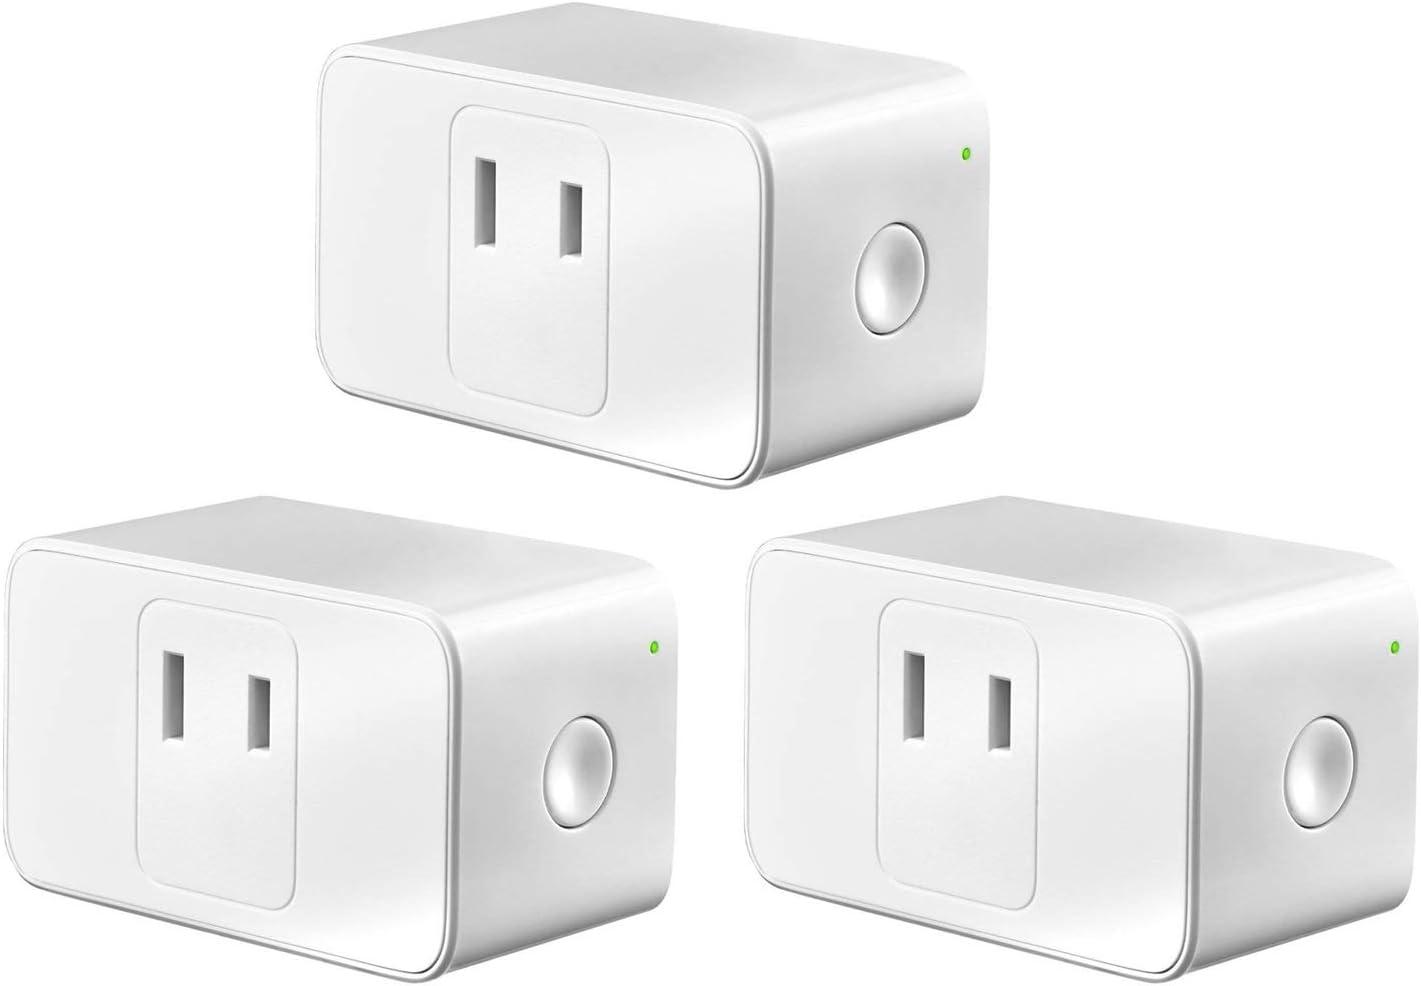 Meross WIFIスマートプラグ スマートコンセント Alexa/Google Home/IFTTT/LINE Clova対応 コンセント スマート 電源制御 遠隔操作(3個入り)